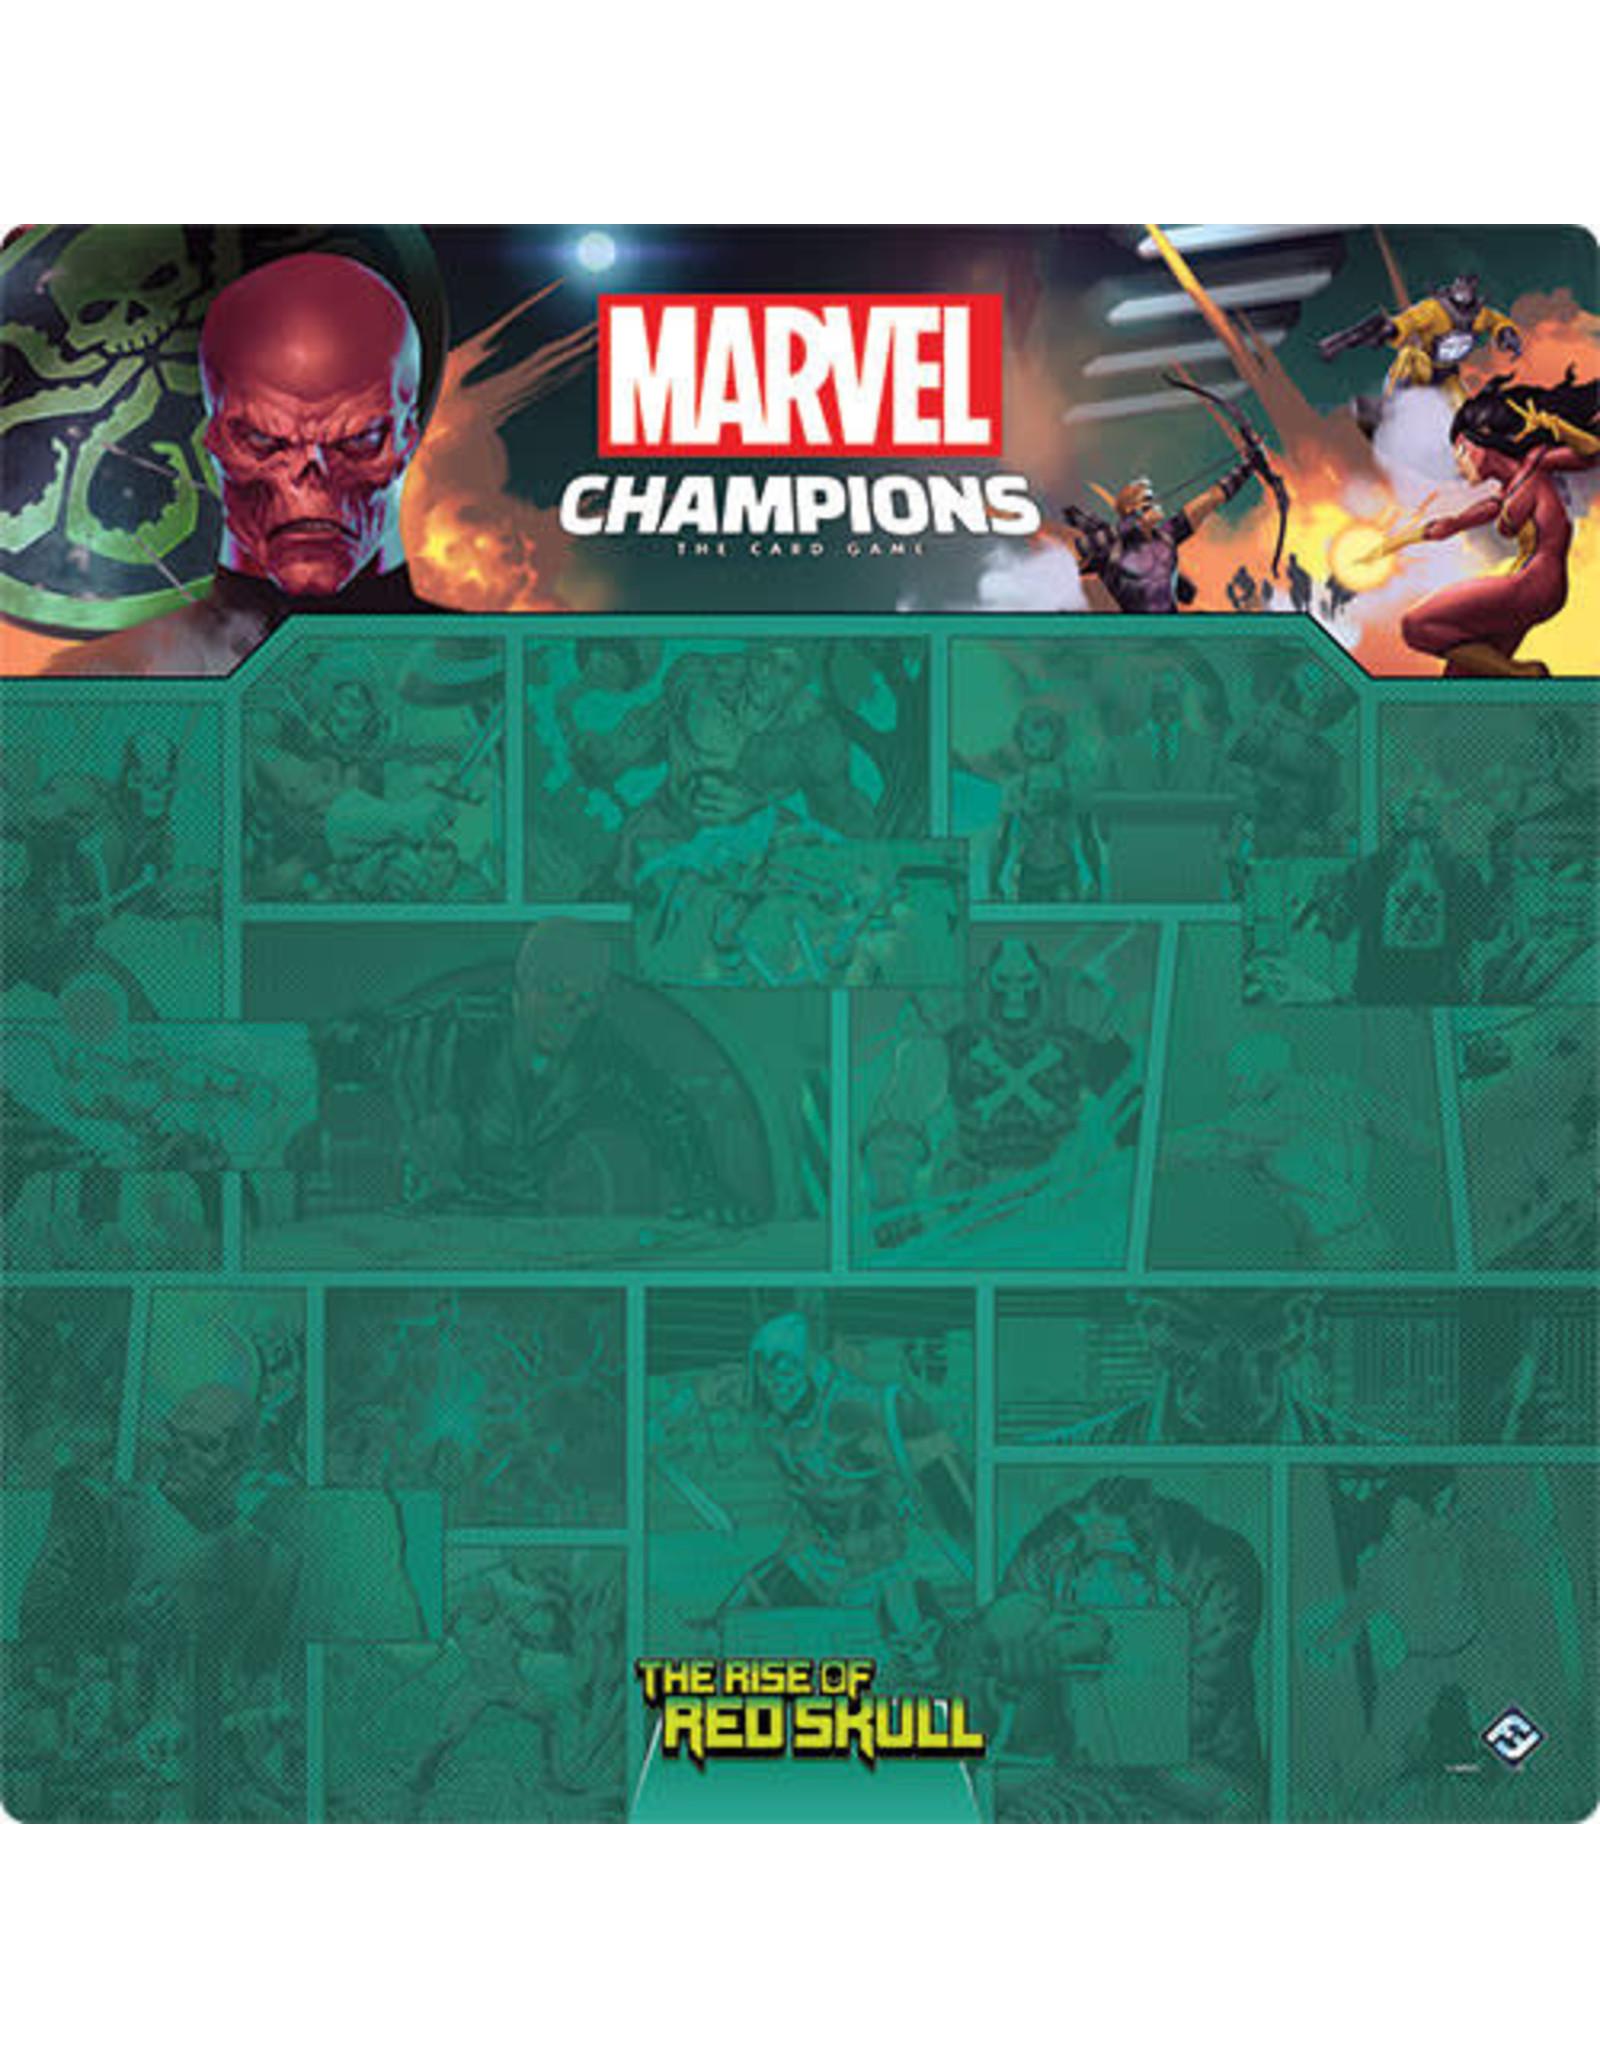 Marvel Champions LCG: Red Skull 1-4 Player Playmat